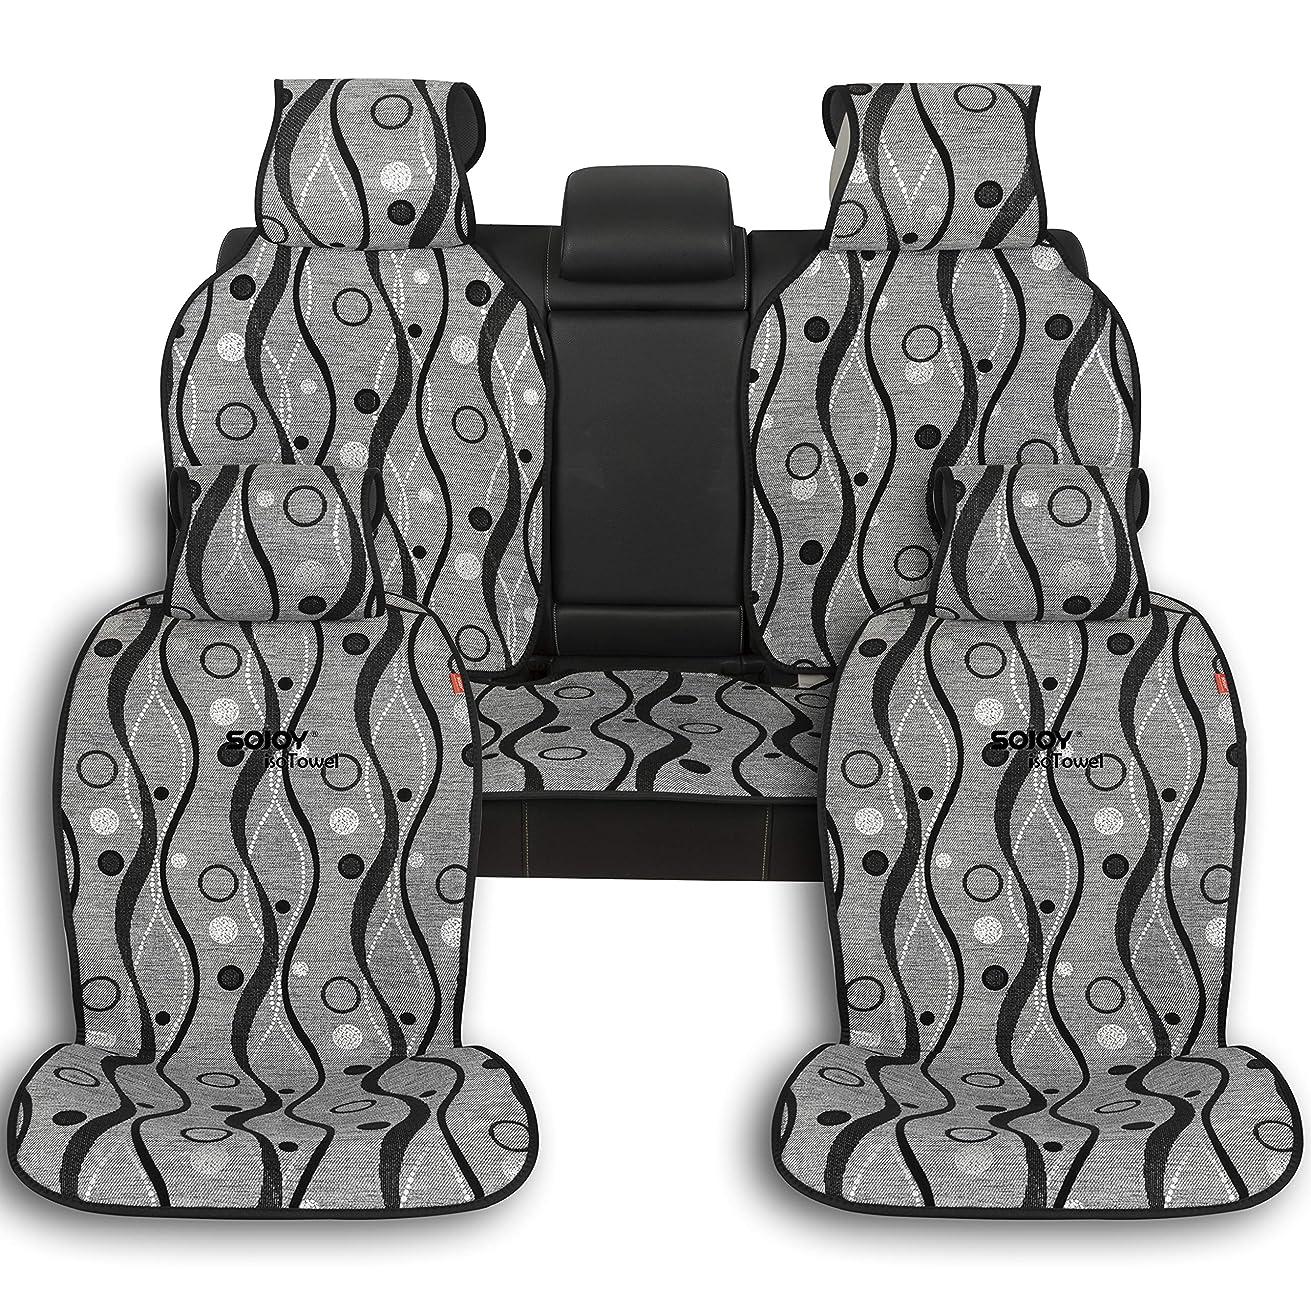 Sojoy Four Seasons Universal Full Set of Car Seat Cushions Covers (Dark Gray)